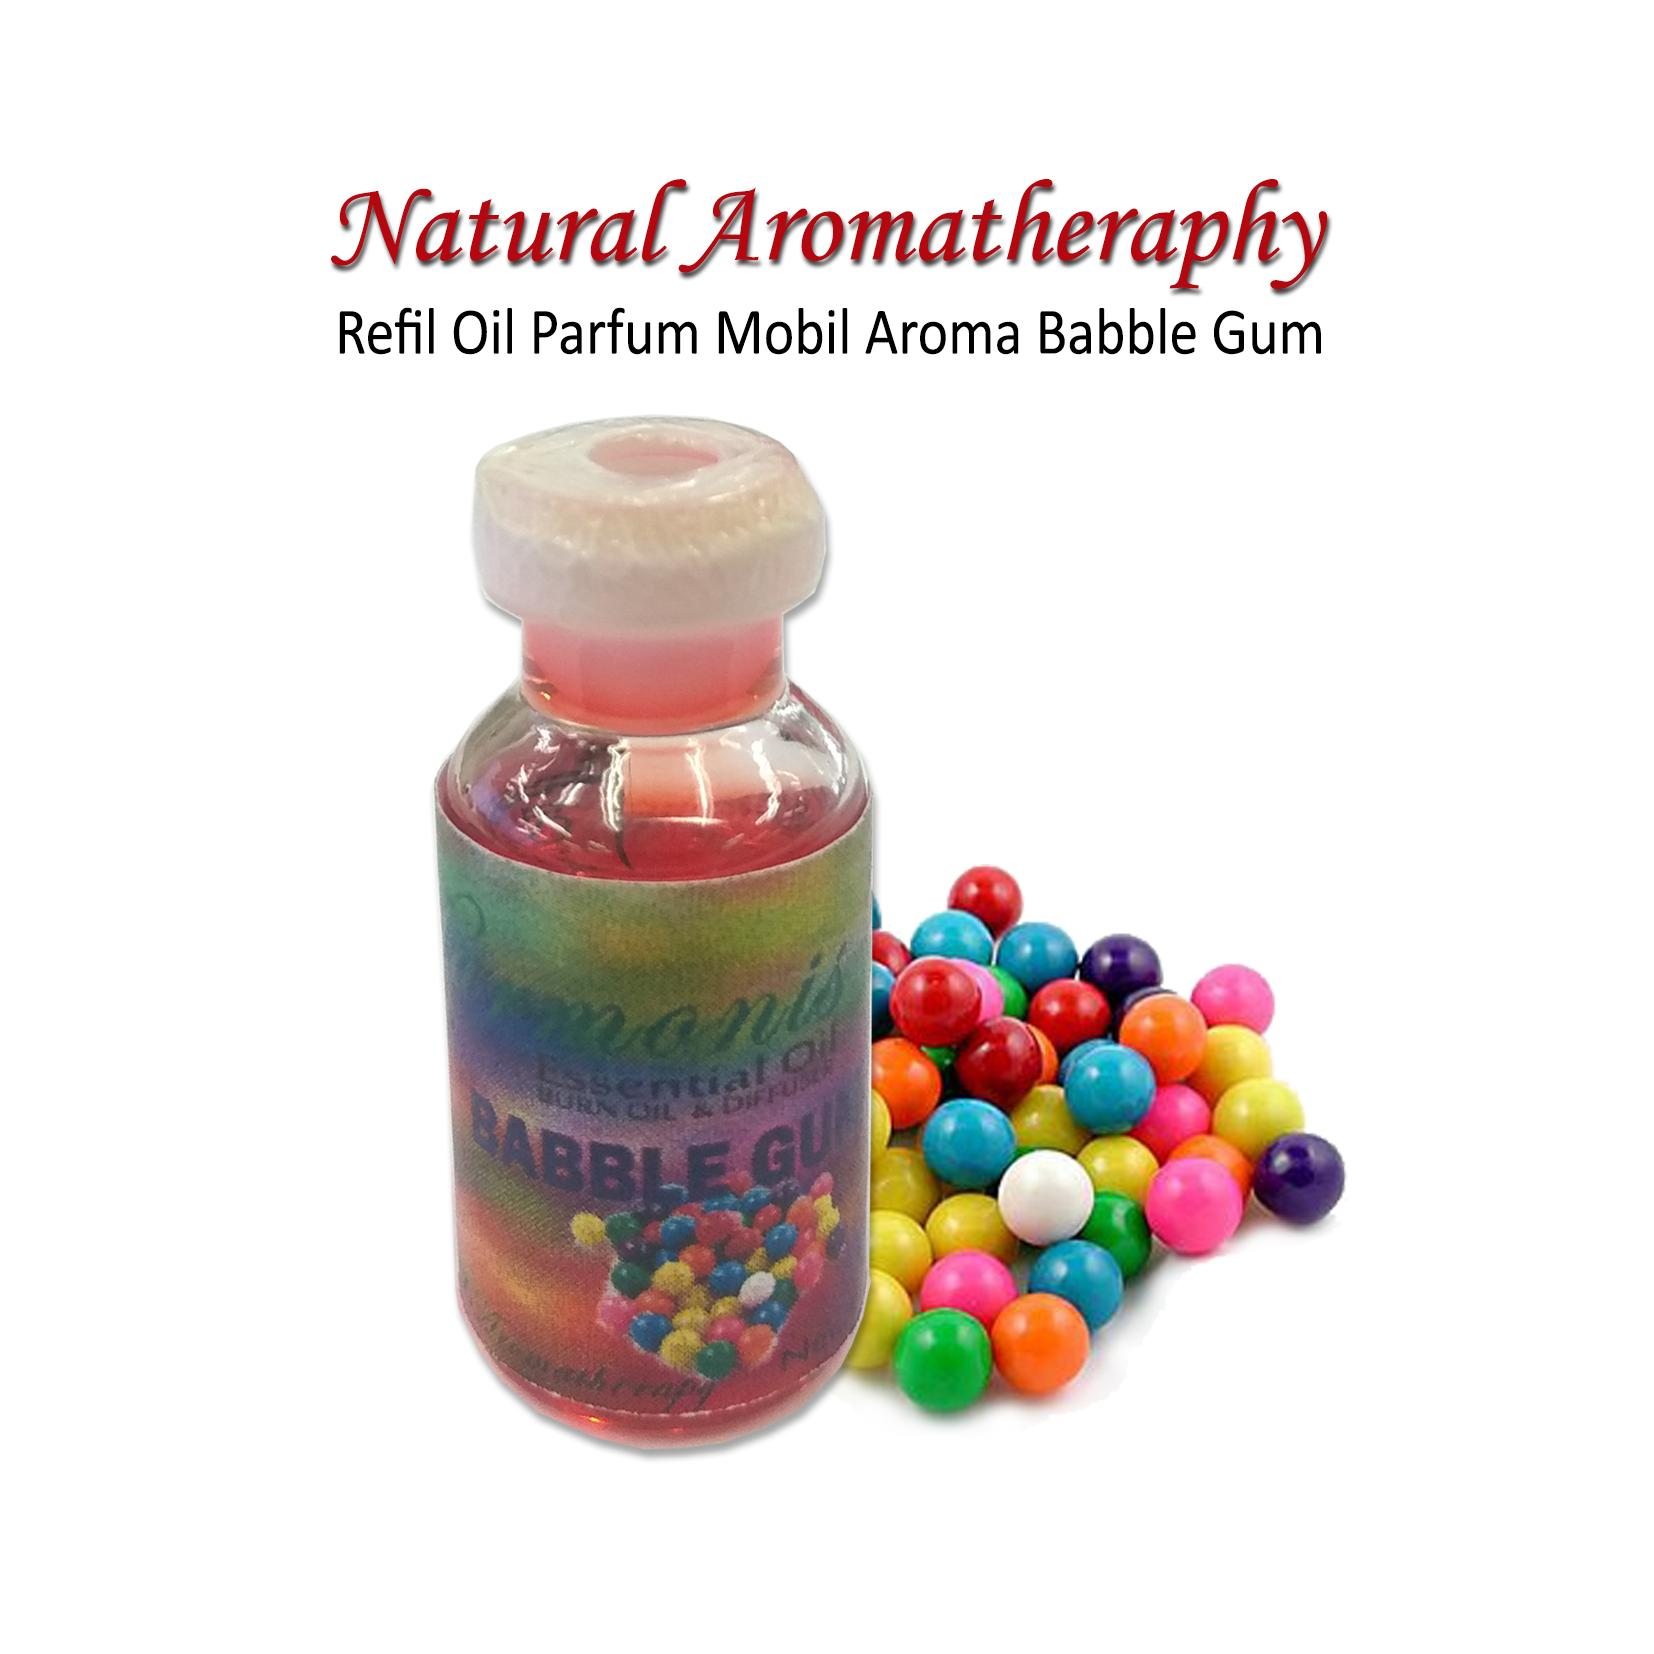 Cek Harga Baru Refil Oil Parfum Mobil Aromaterapi Aroma Lemongrass Car Vehicle Aromatherapy Humidifier Babble Gum Unt Diffuser Usb